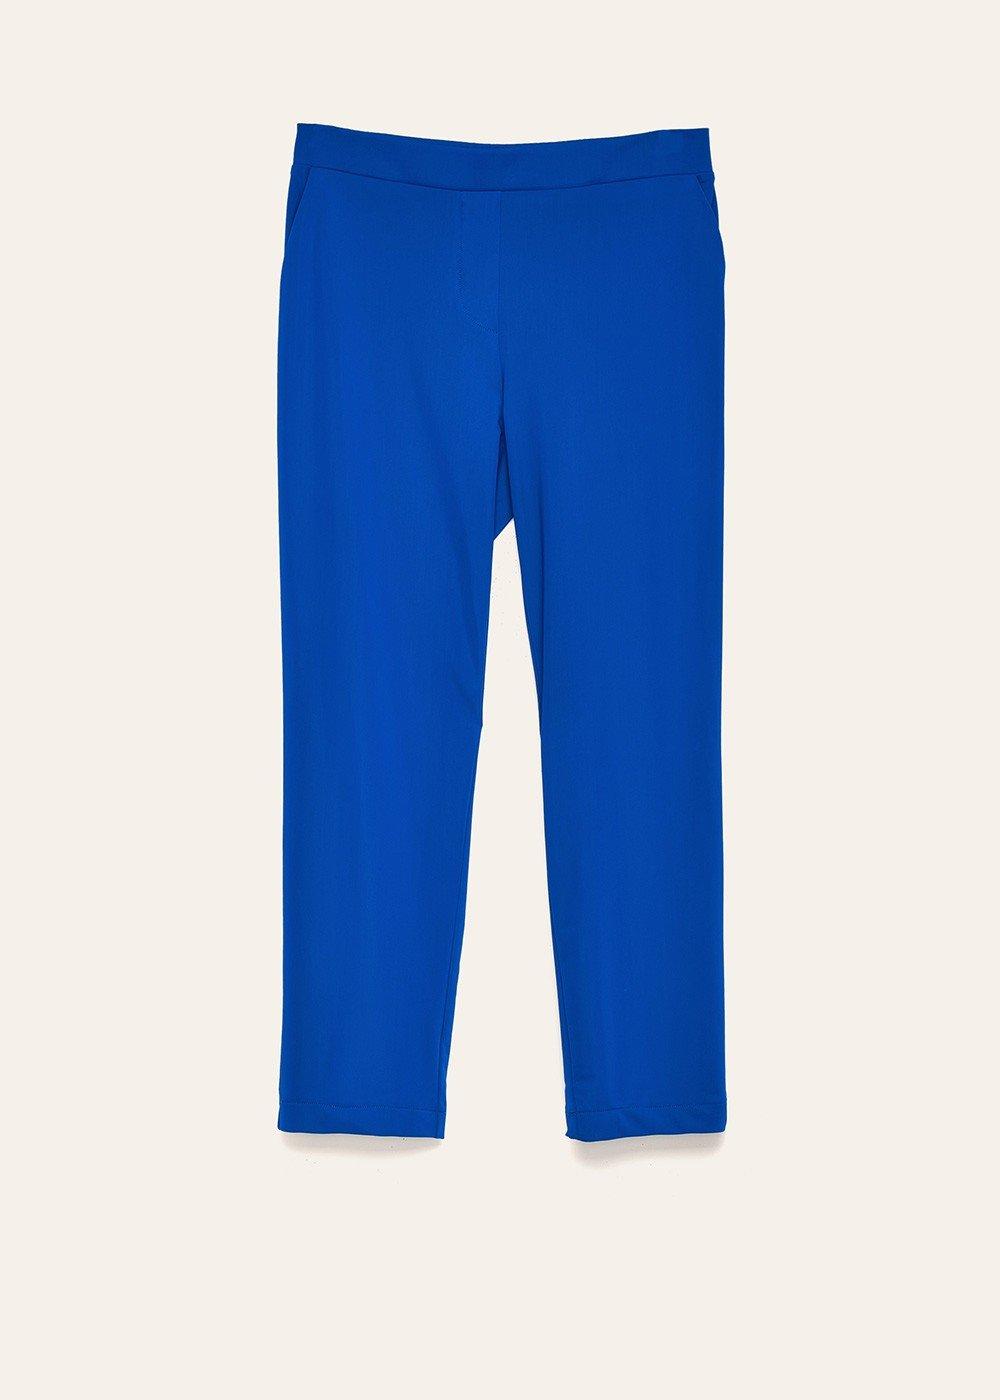 Pantalone elastico Cara tessuto tecnico - Abisso - Donna